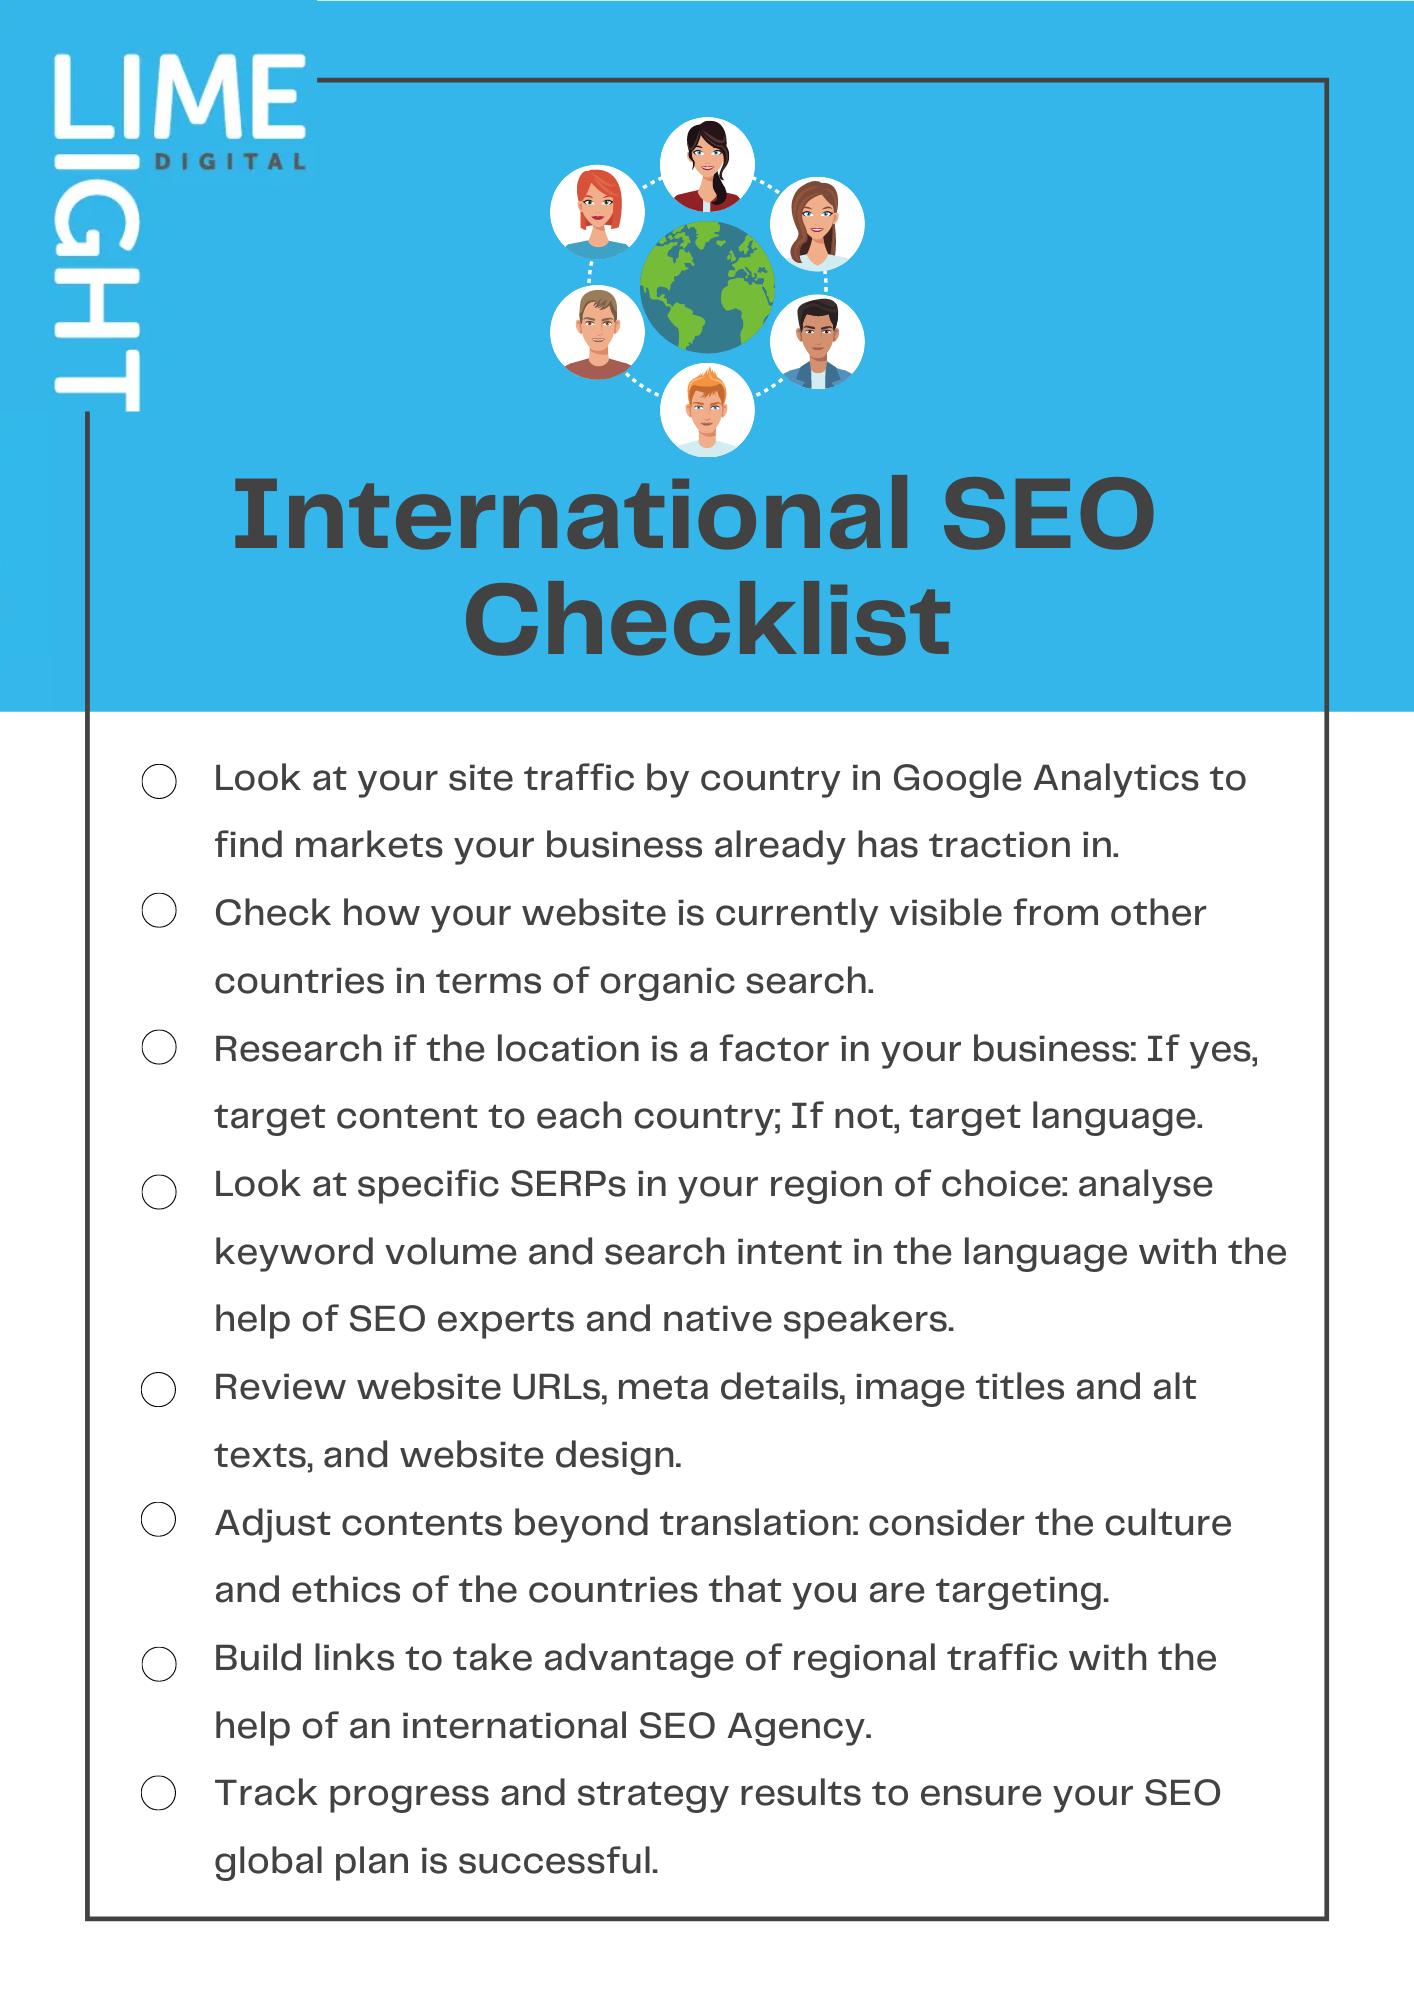 Limelight-Digital-International-SEO-Checklist